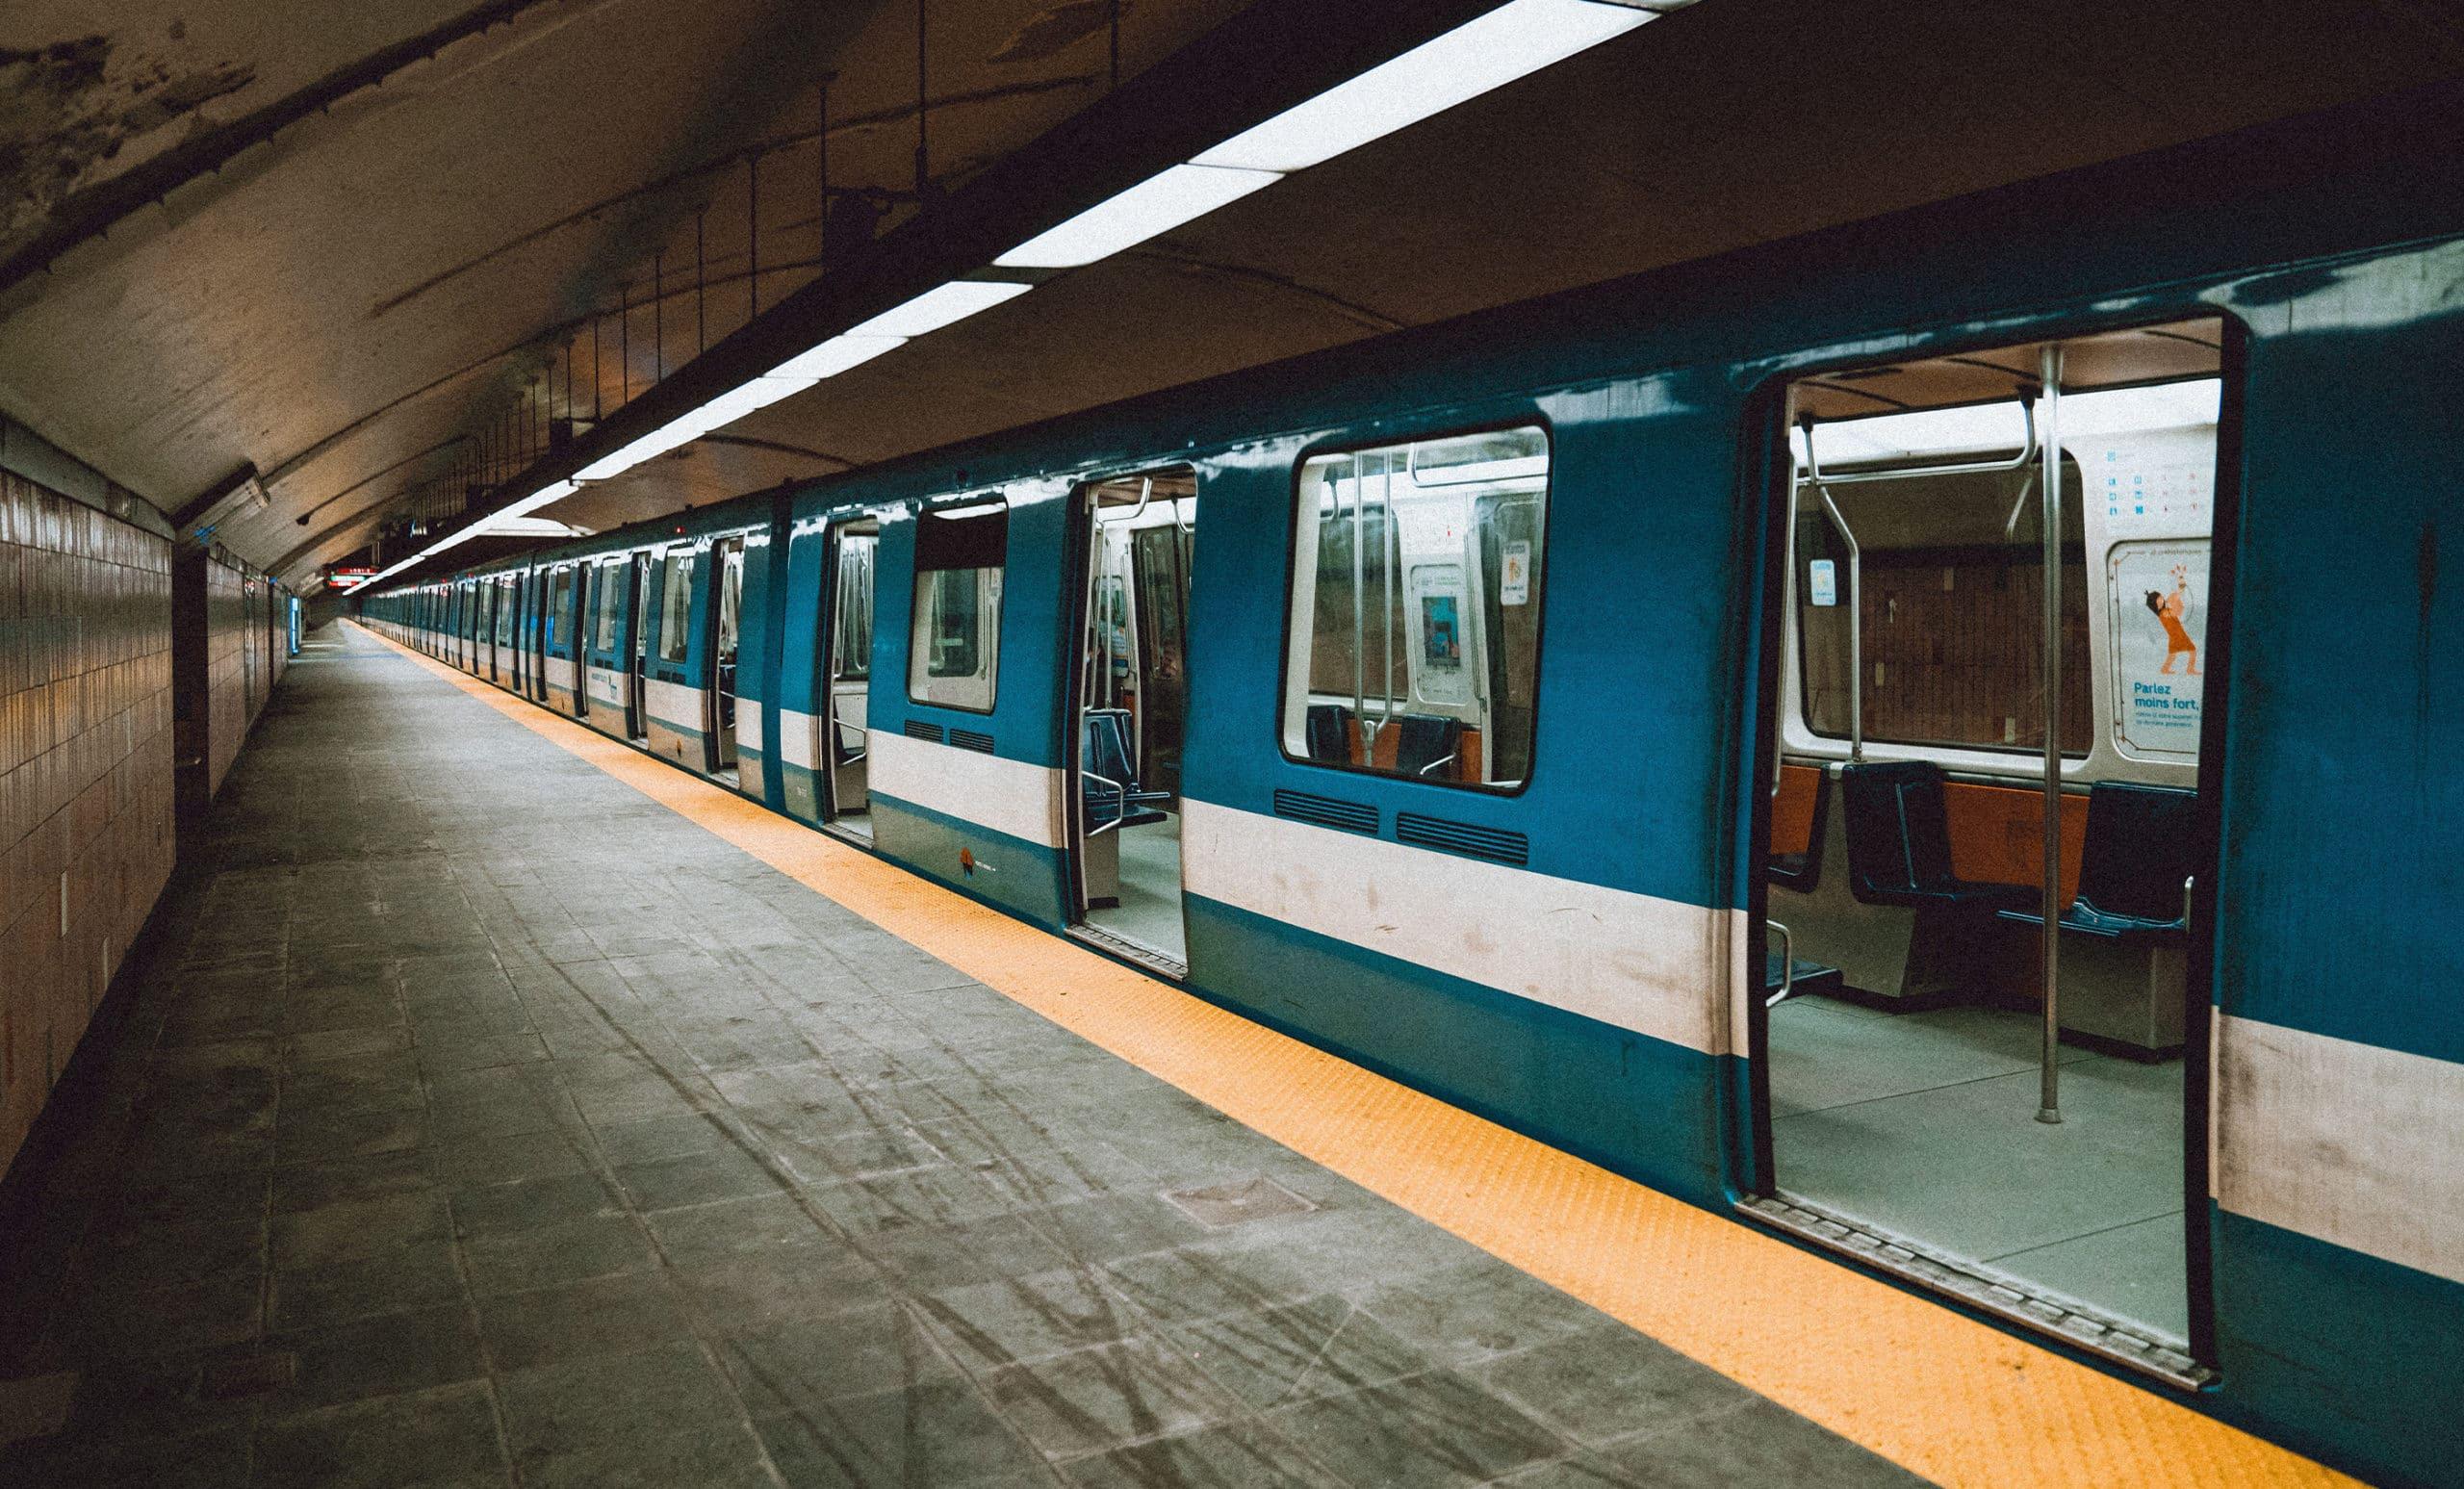 Empty subway amidst social distancing orders in response to COVID-19 novel Corona virus pandemic